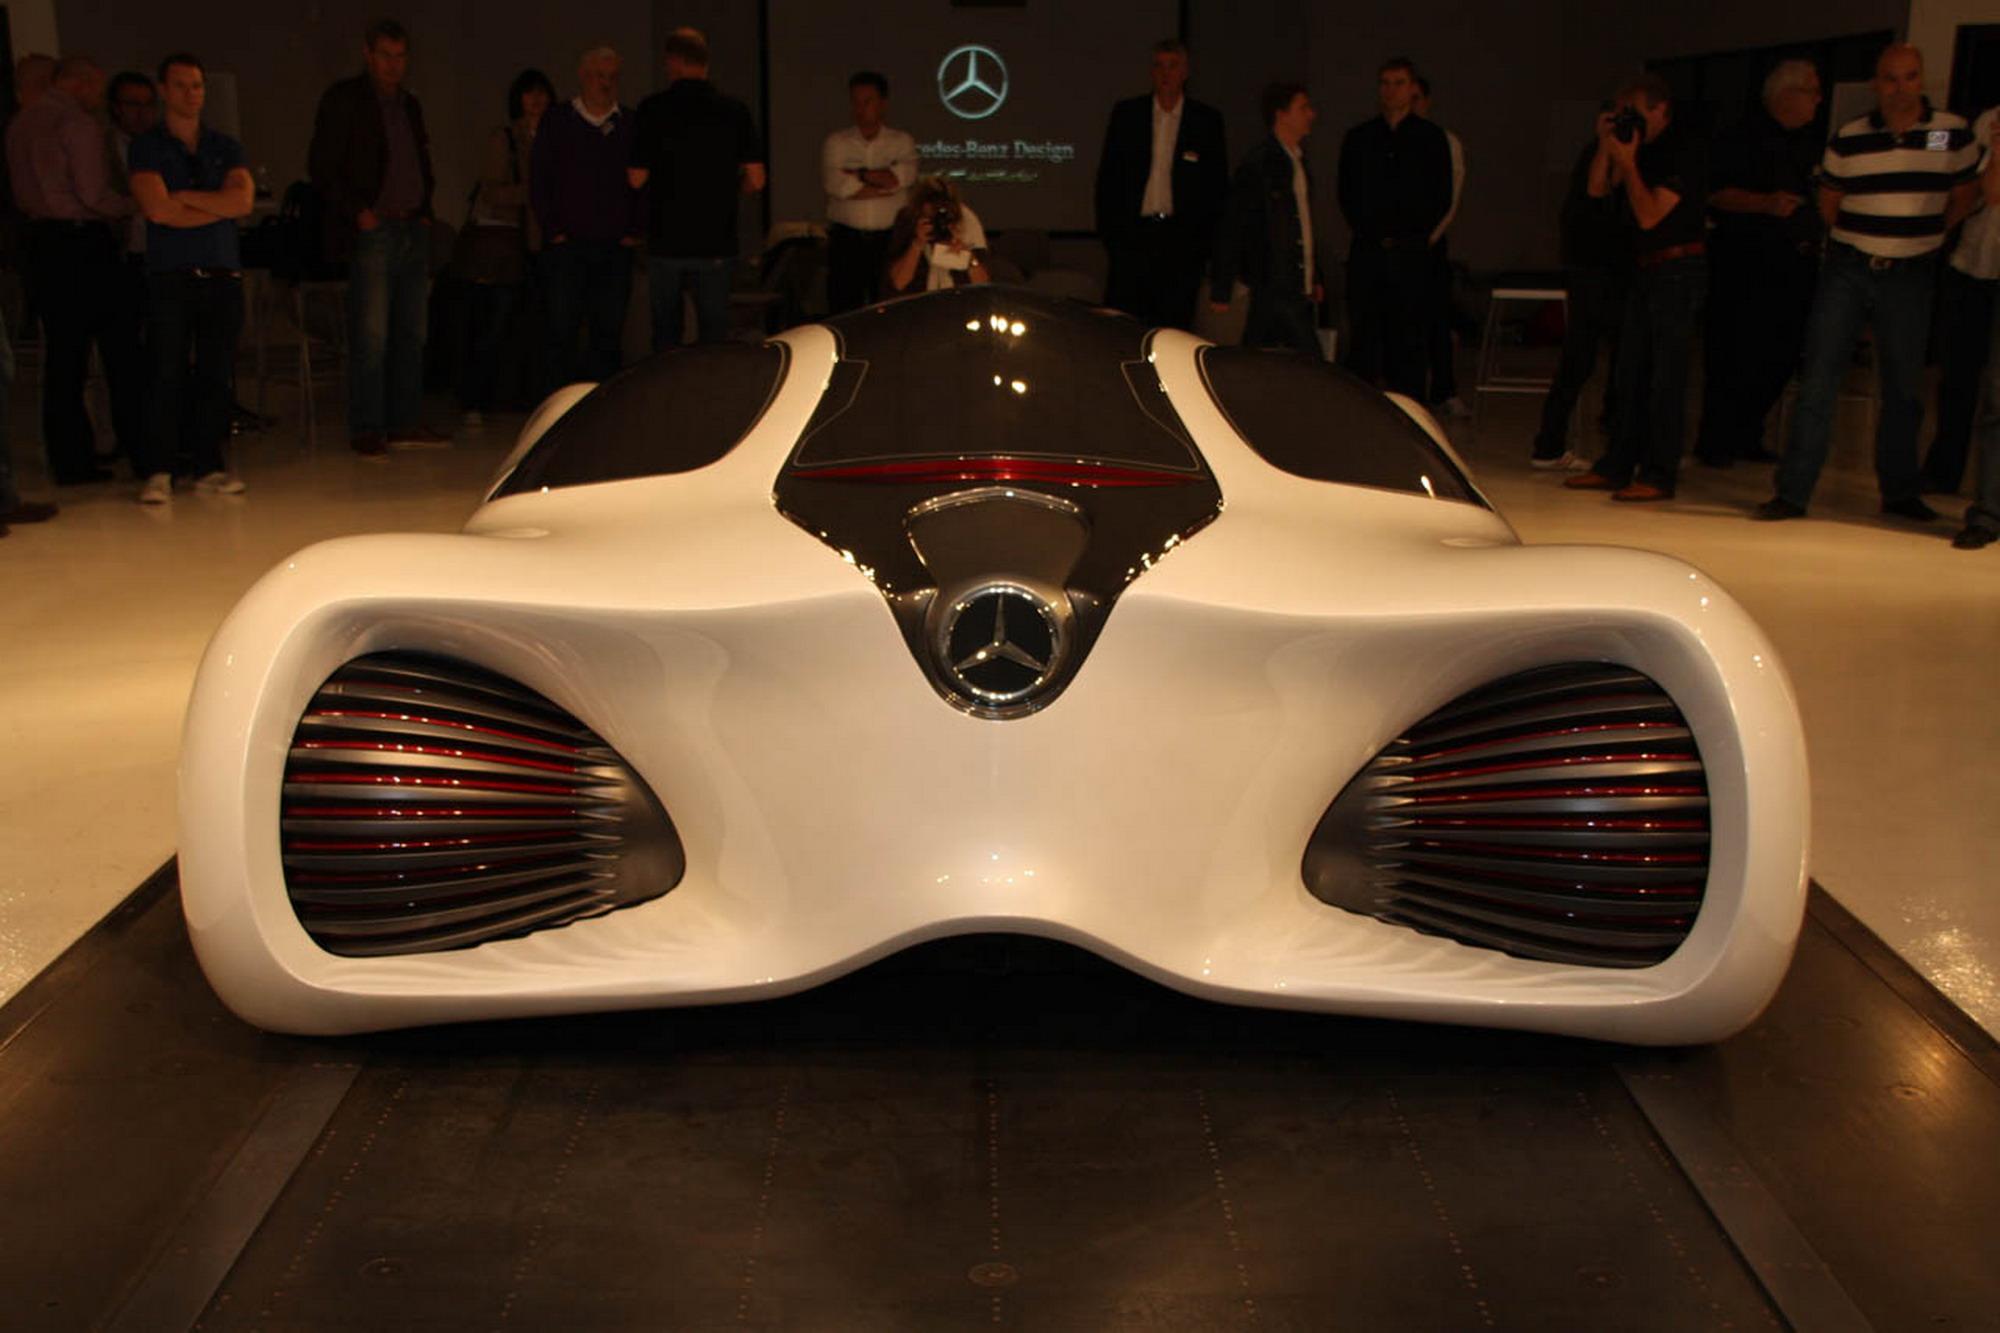 "Mercedes Benz Biome"" - Images of a futuristic car"